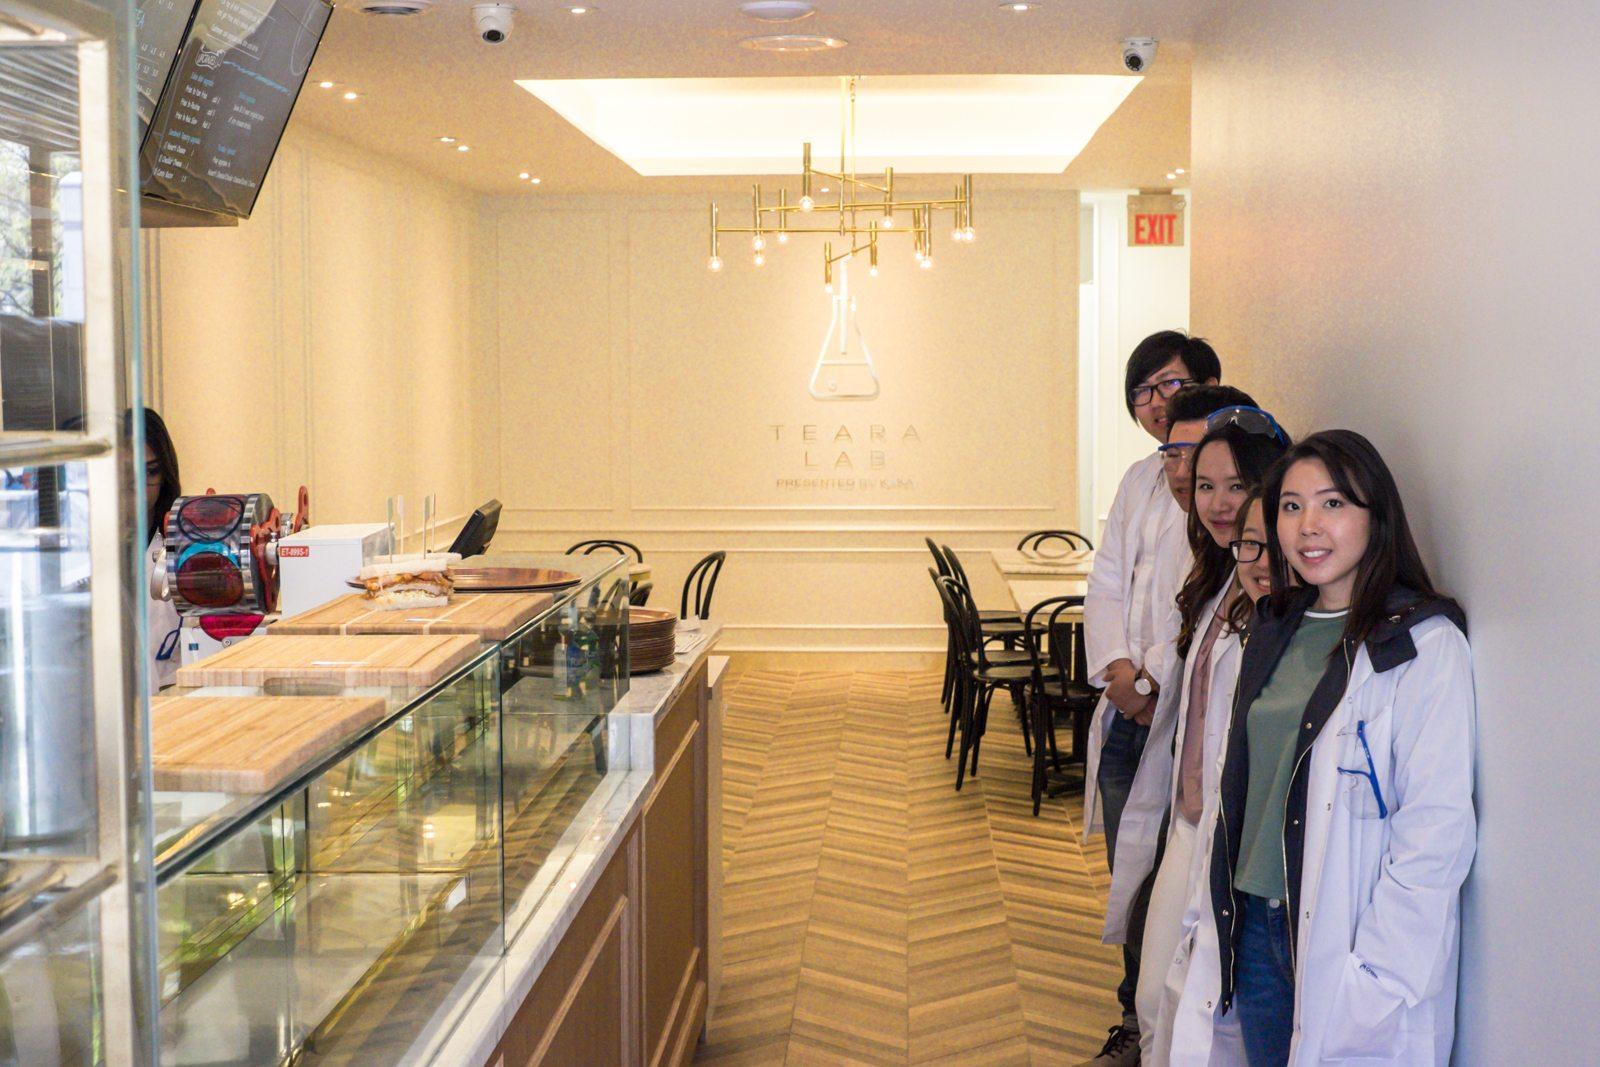 toronto-restaurants-teara-lab-japanese-sandwiches-university-interior-1